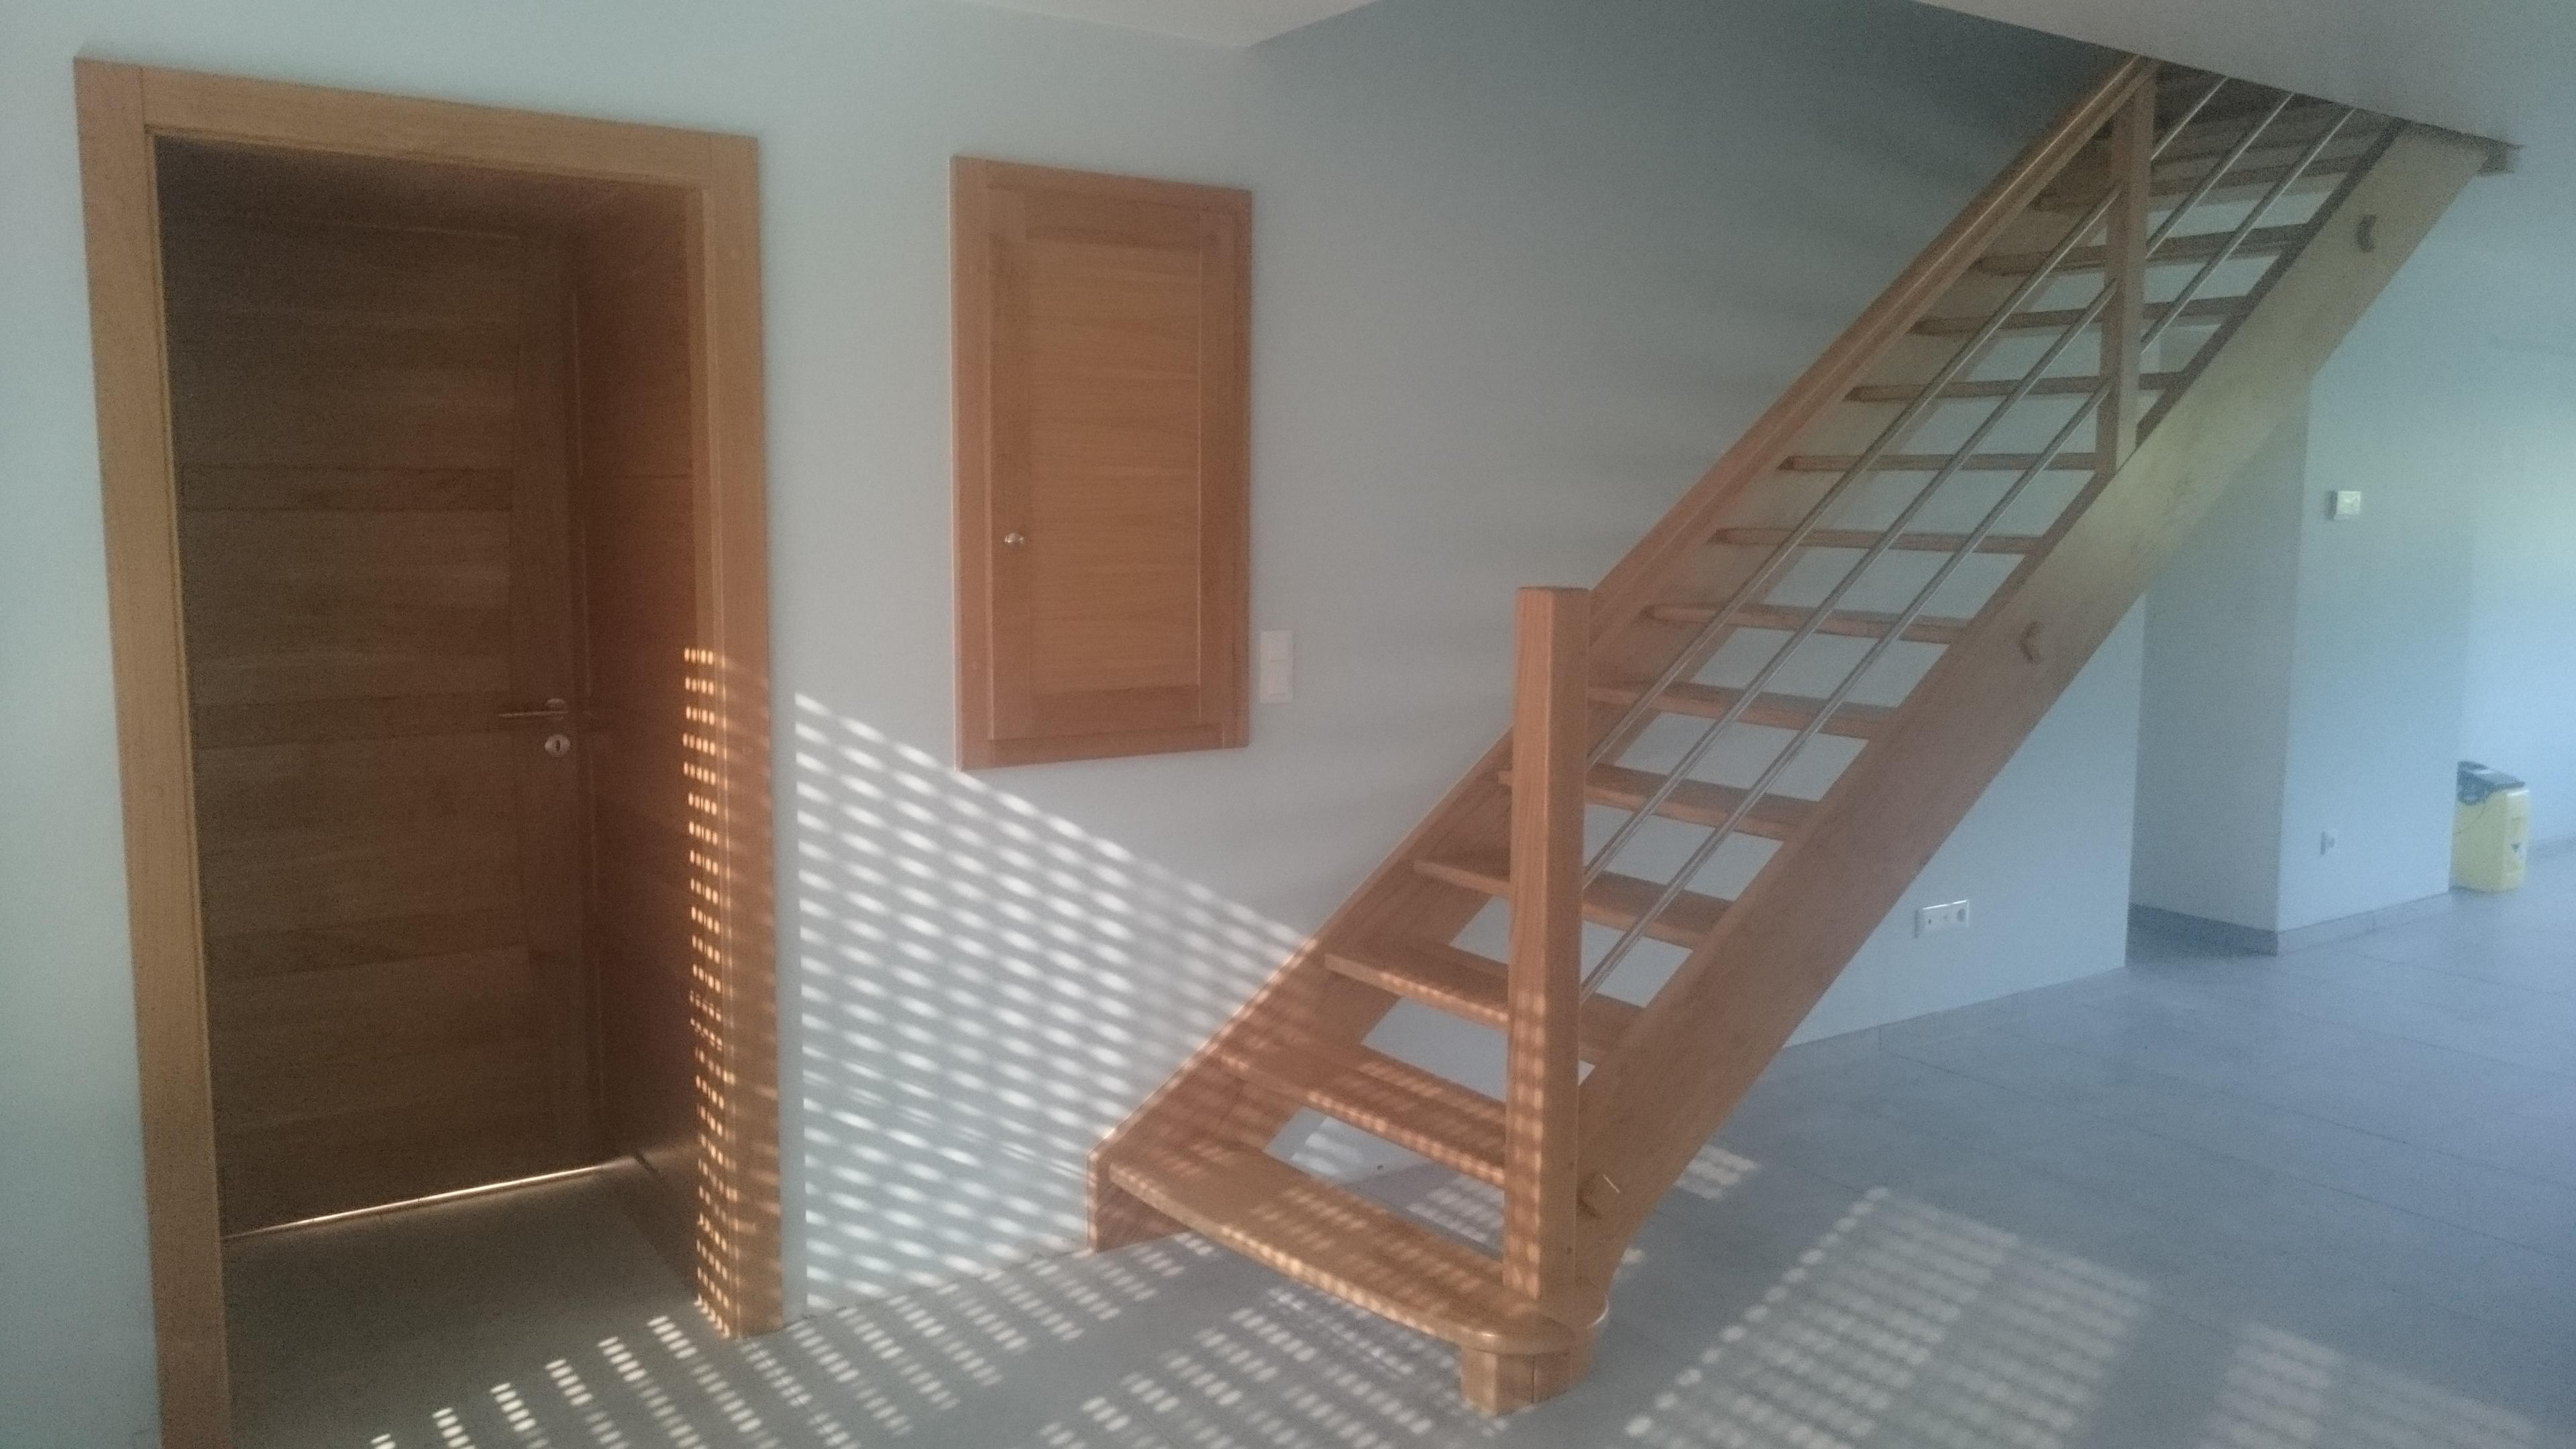 Menuiserie Figard - Fabrication sur mesure - Escalier droit - Chêne inox - Vesoul